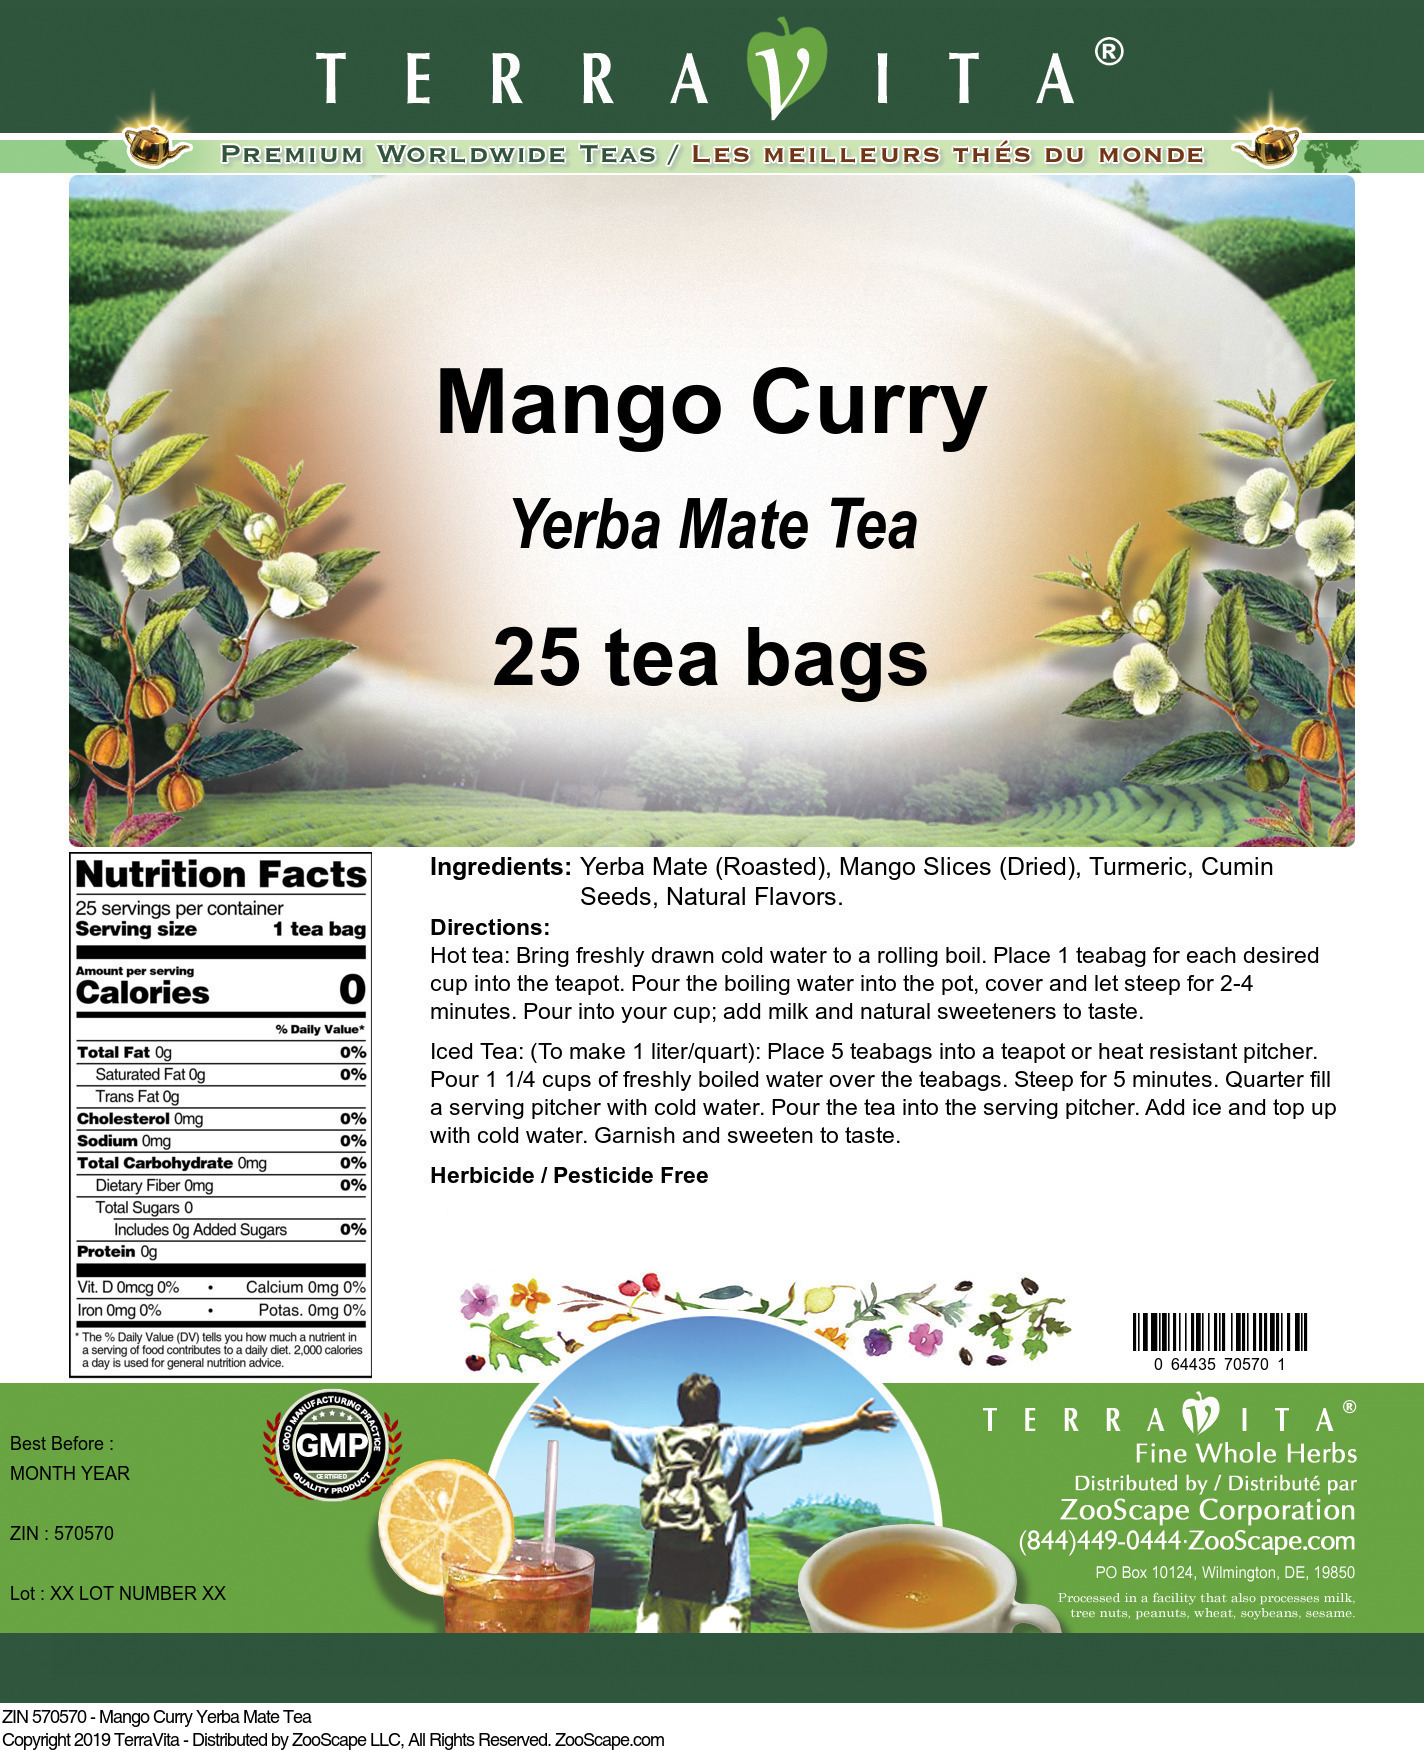 Mango Curry Yerba Mate Tea